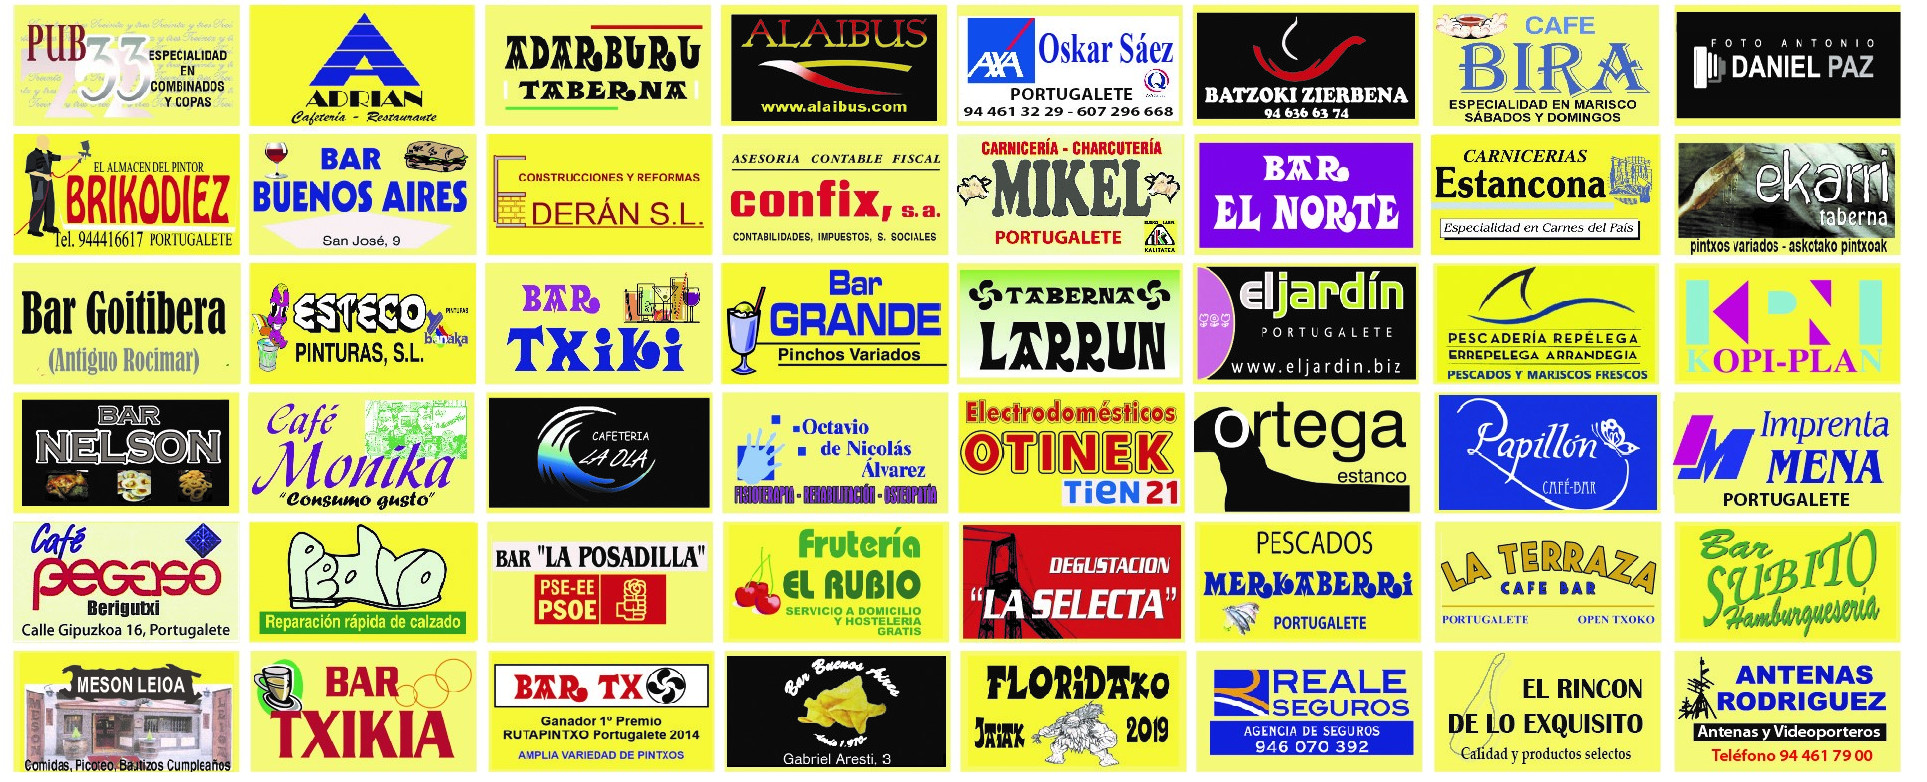 patrocinadores-cartel-partidos-club-portugalete-2020-v1